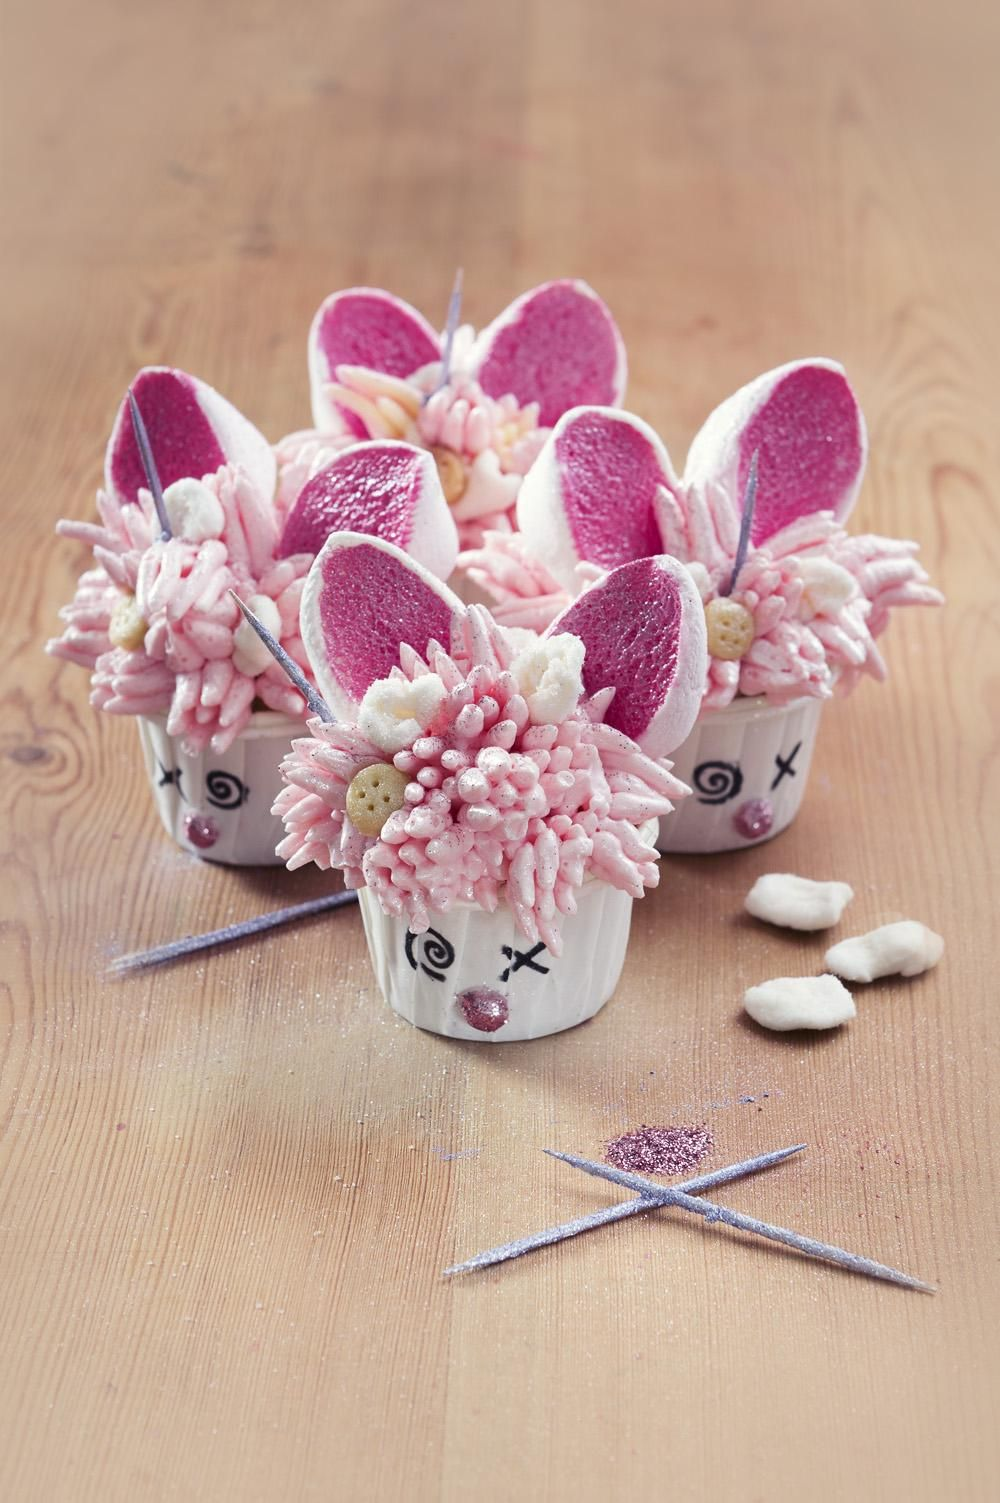 [HOMEMADE][PASTRY] Cuddly bunny cupcake - Vanilla cake with marshamallows buttercream